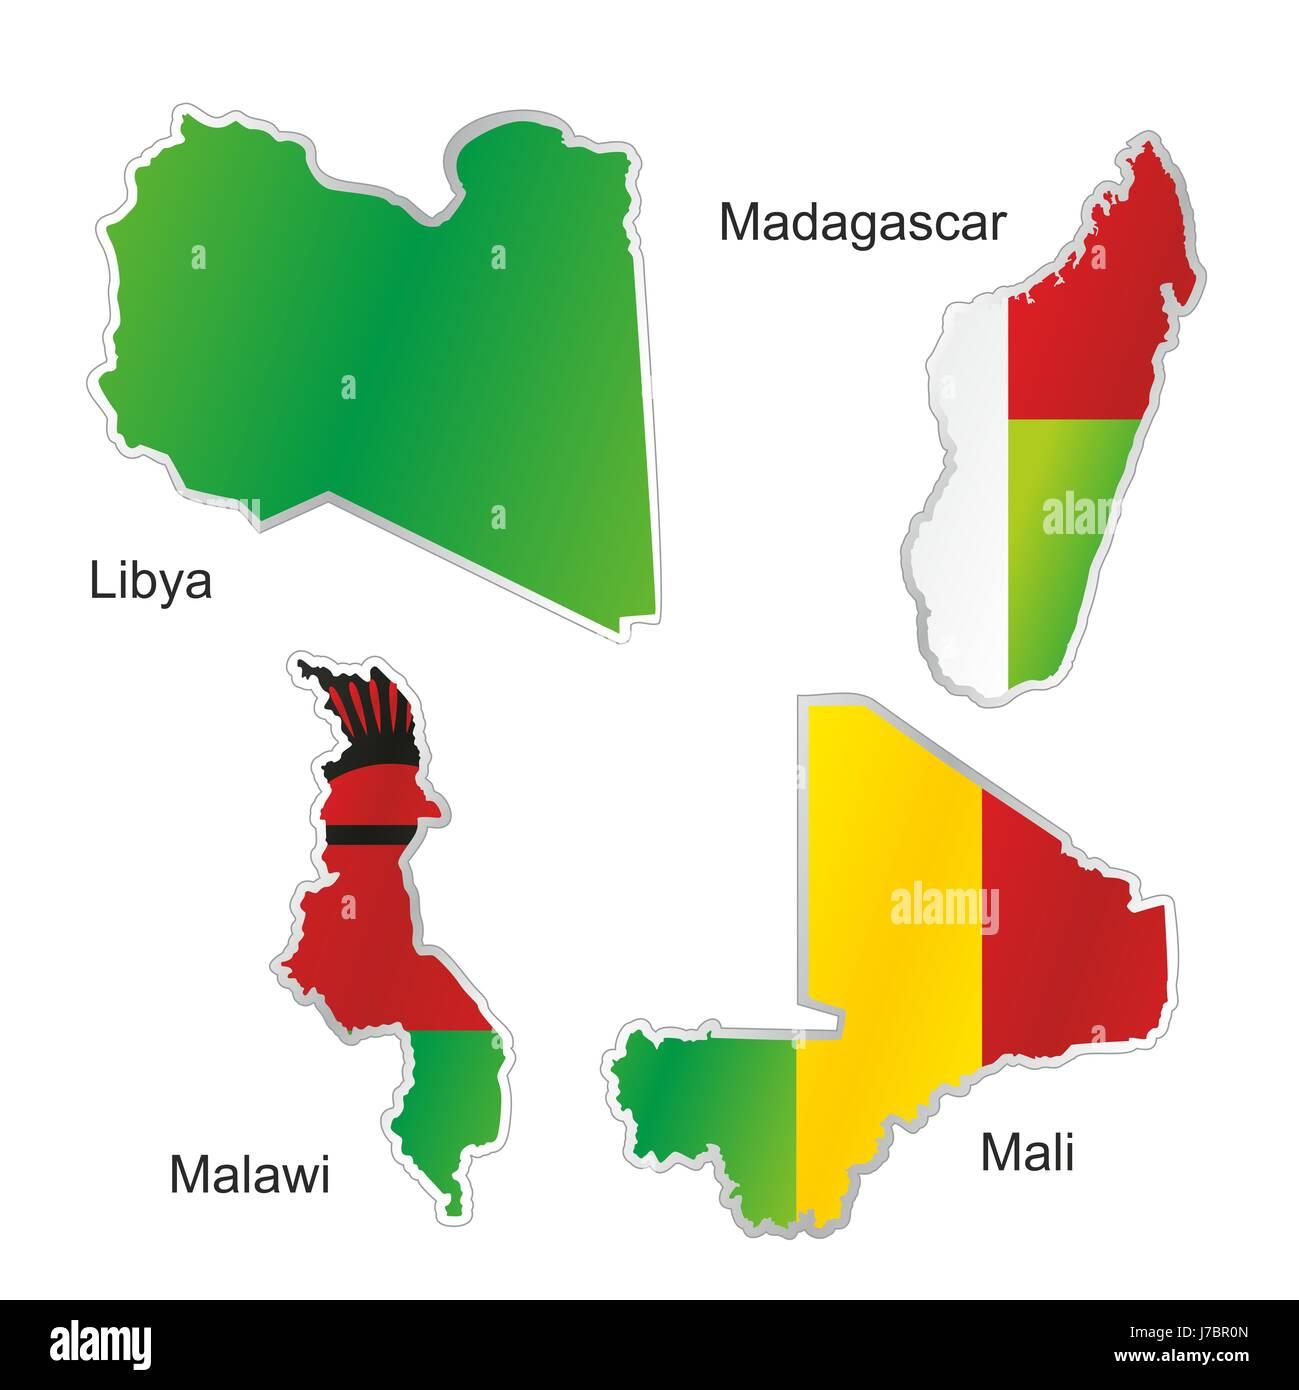 Africa libya flag mali madagascar malawi map atlas map of the world africa libya flag mali madagascar malawi map atlas map of the world isolated gumiabroncs Image collections